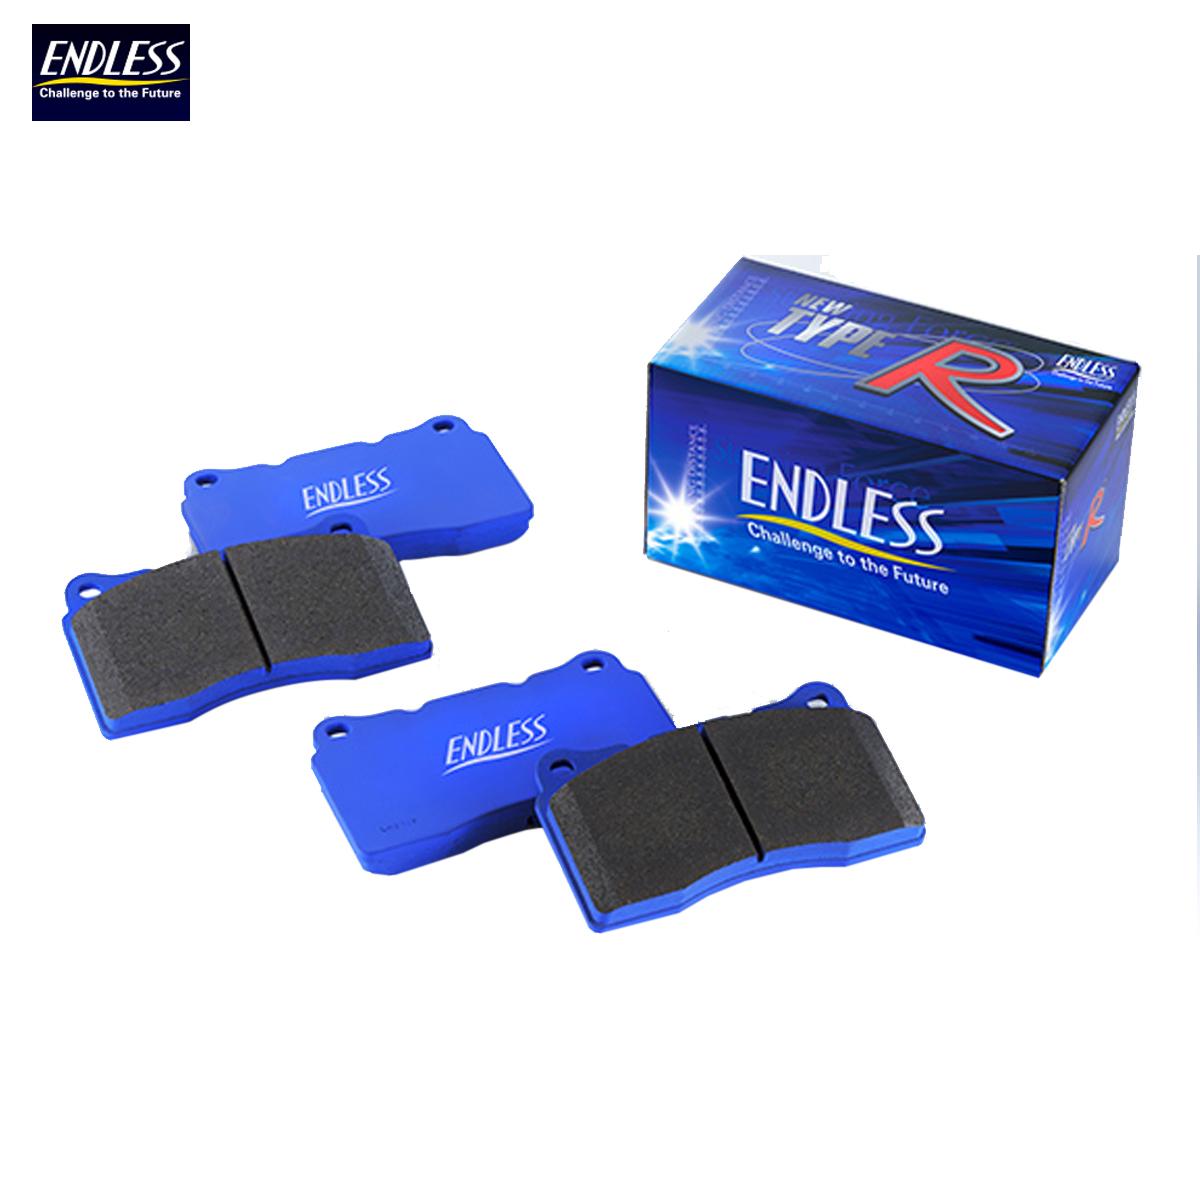 ENDLESS エンドレス ブレーキパッド タイプRセット フロント EP380 リア EP354 ヴェロッサ JZX110 (NA) GX110